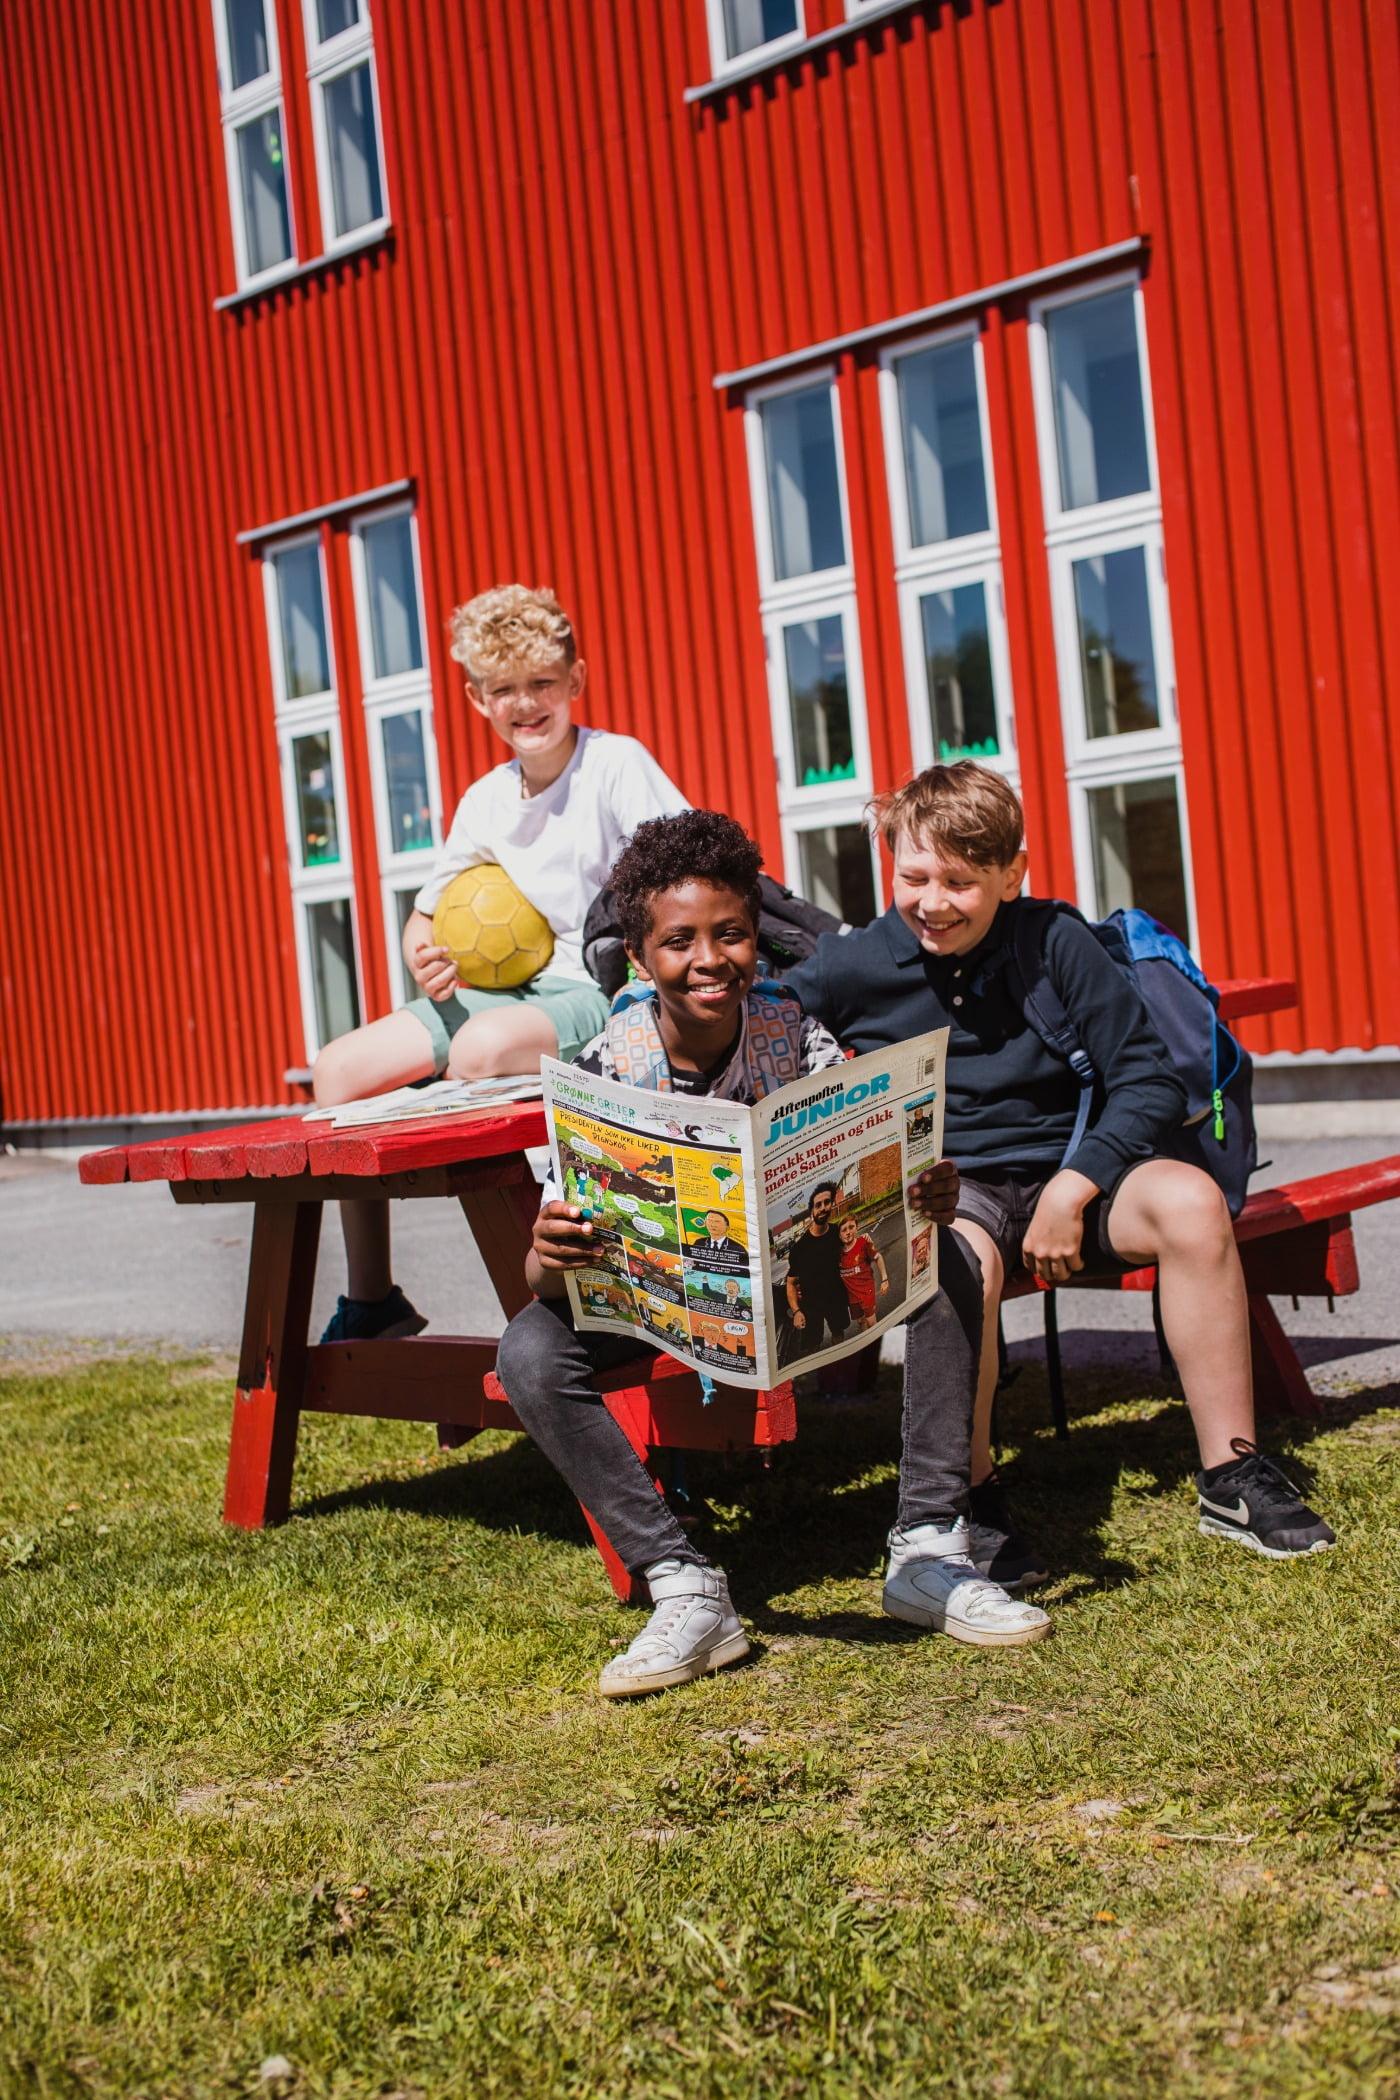 Outdoor furniture, Footwear, Jeans, Window, Shorts, Table, Grass, Leisure, Fun, Community